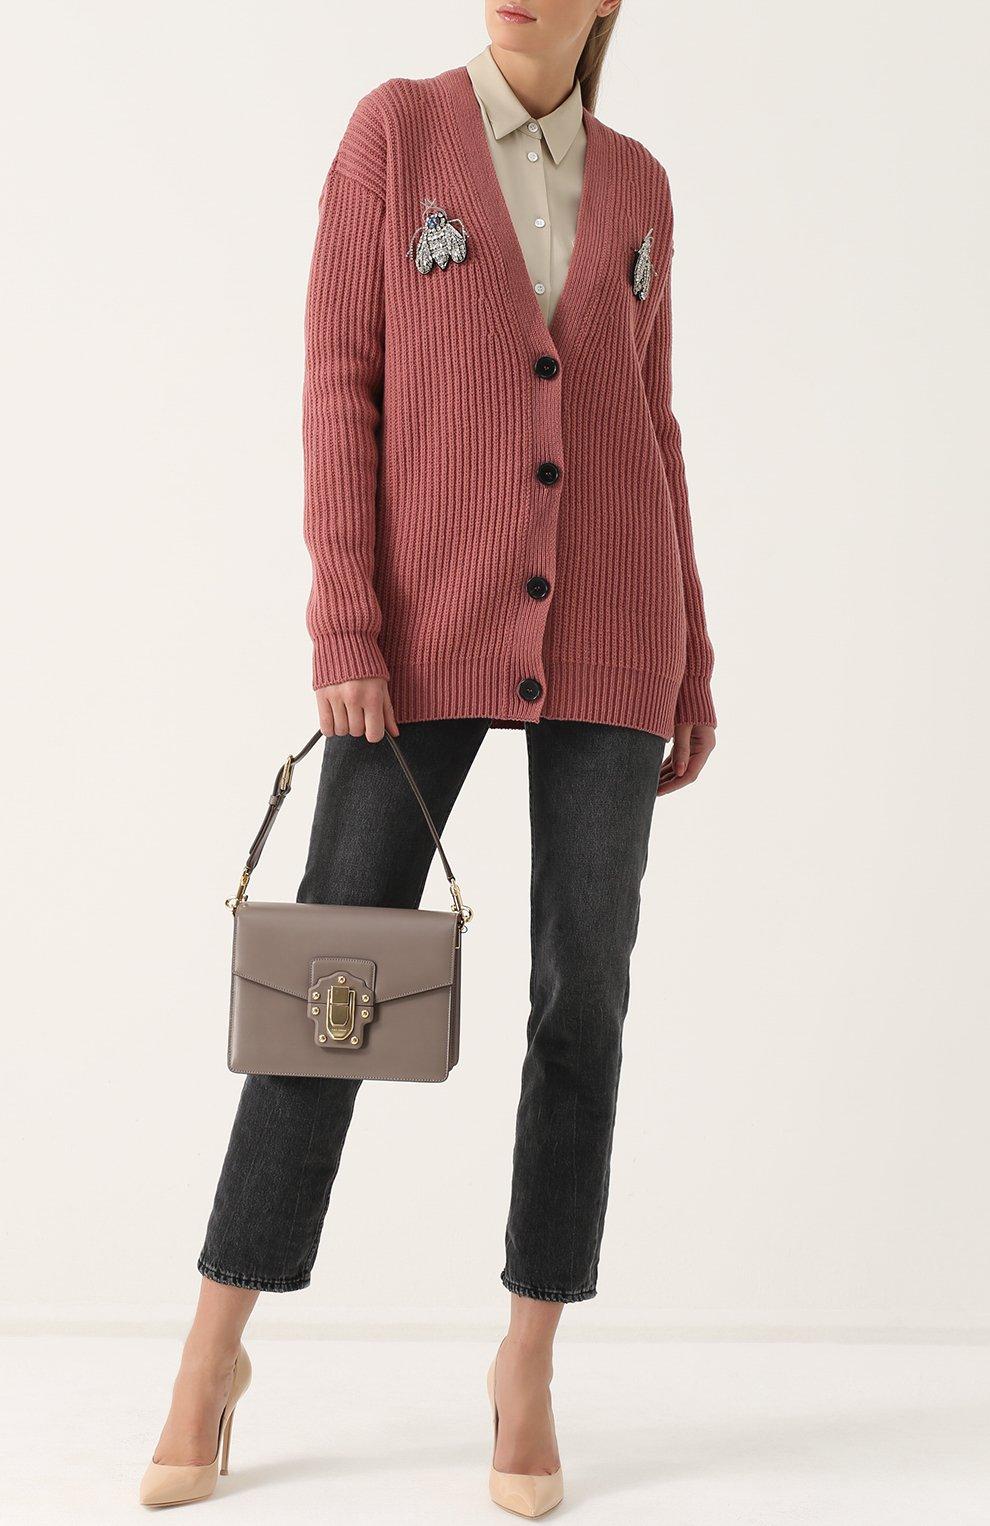 Сумка Lucia Dolce & Gabbana серая цвета | Фото №2